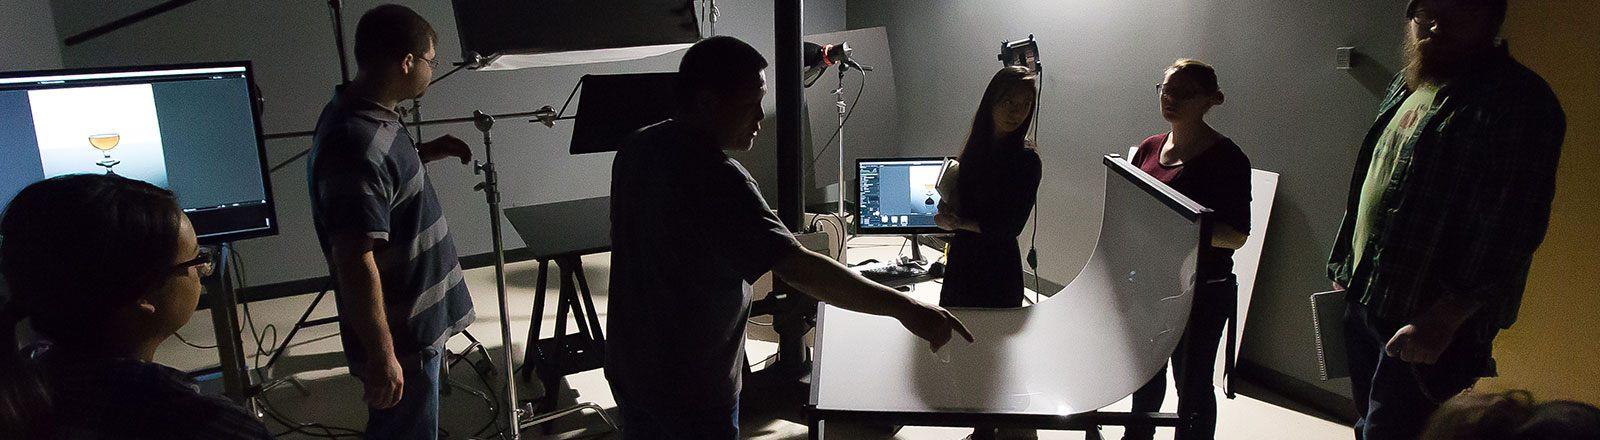 Students working in photo studio